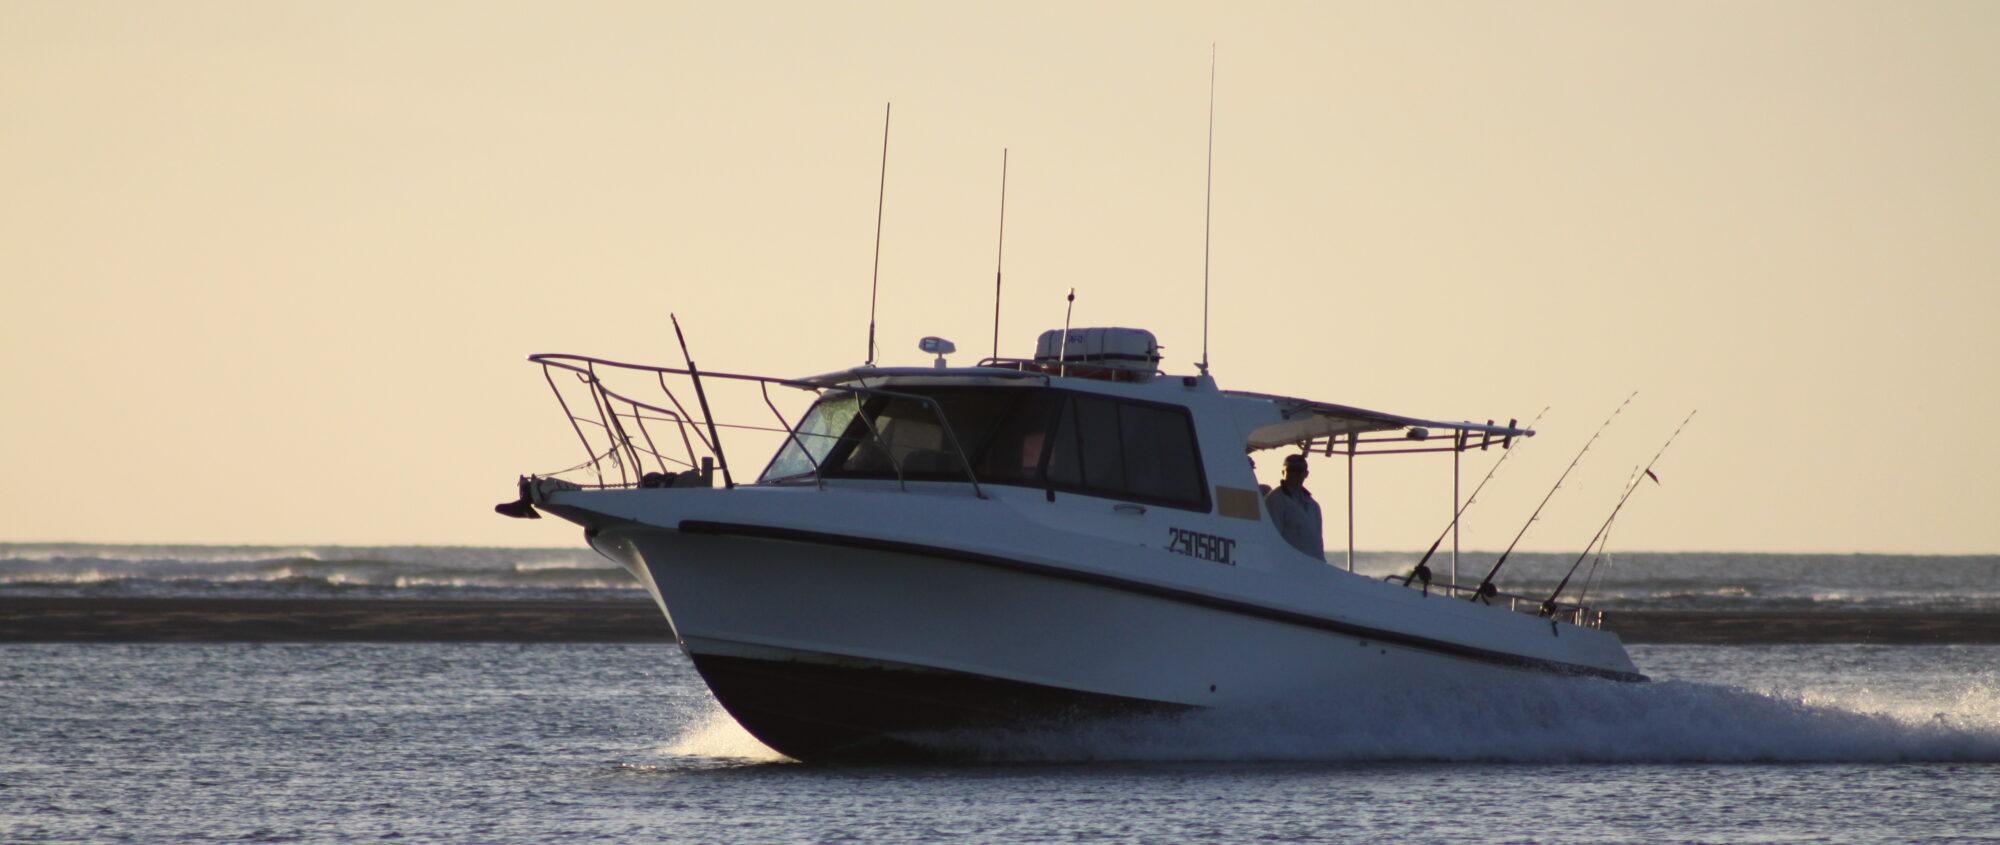 Hooked On 1770 Fishing Charters